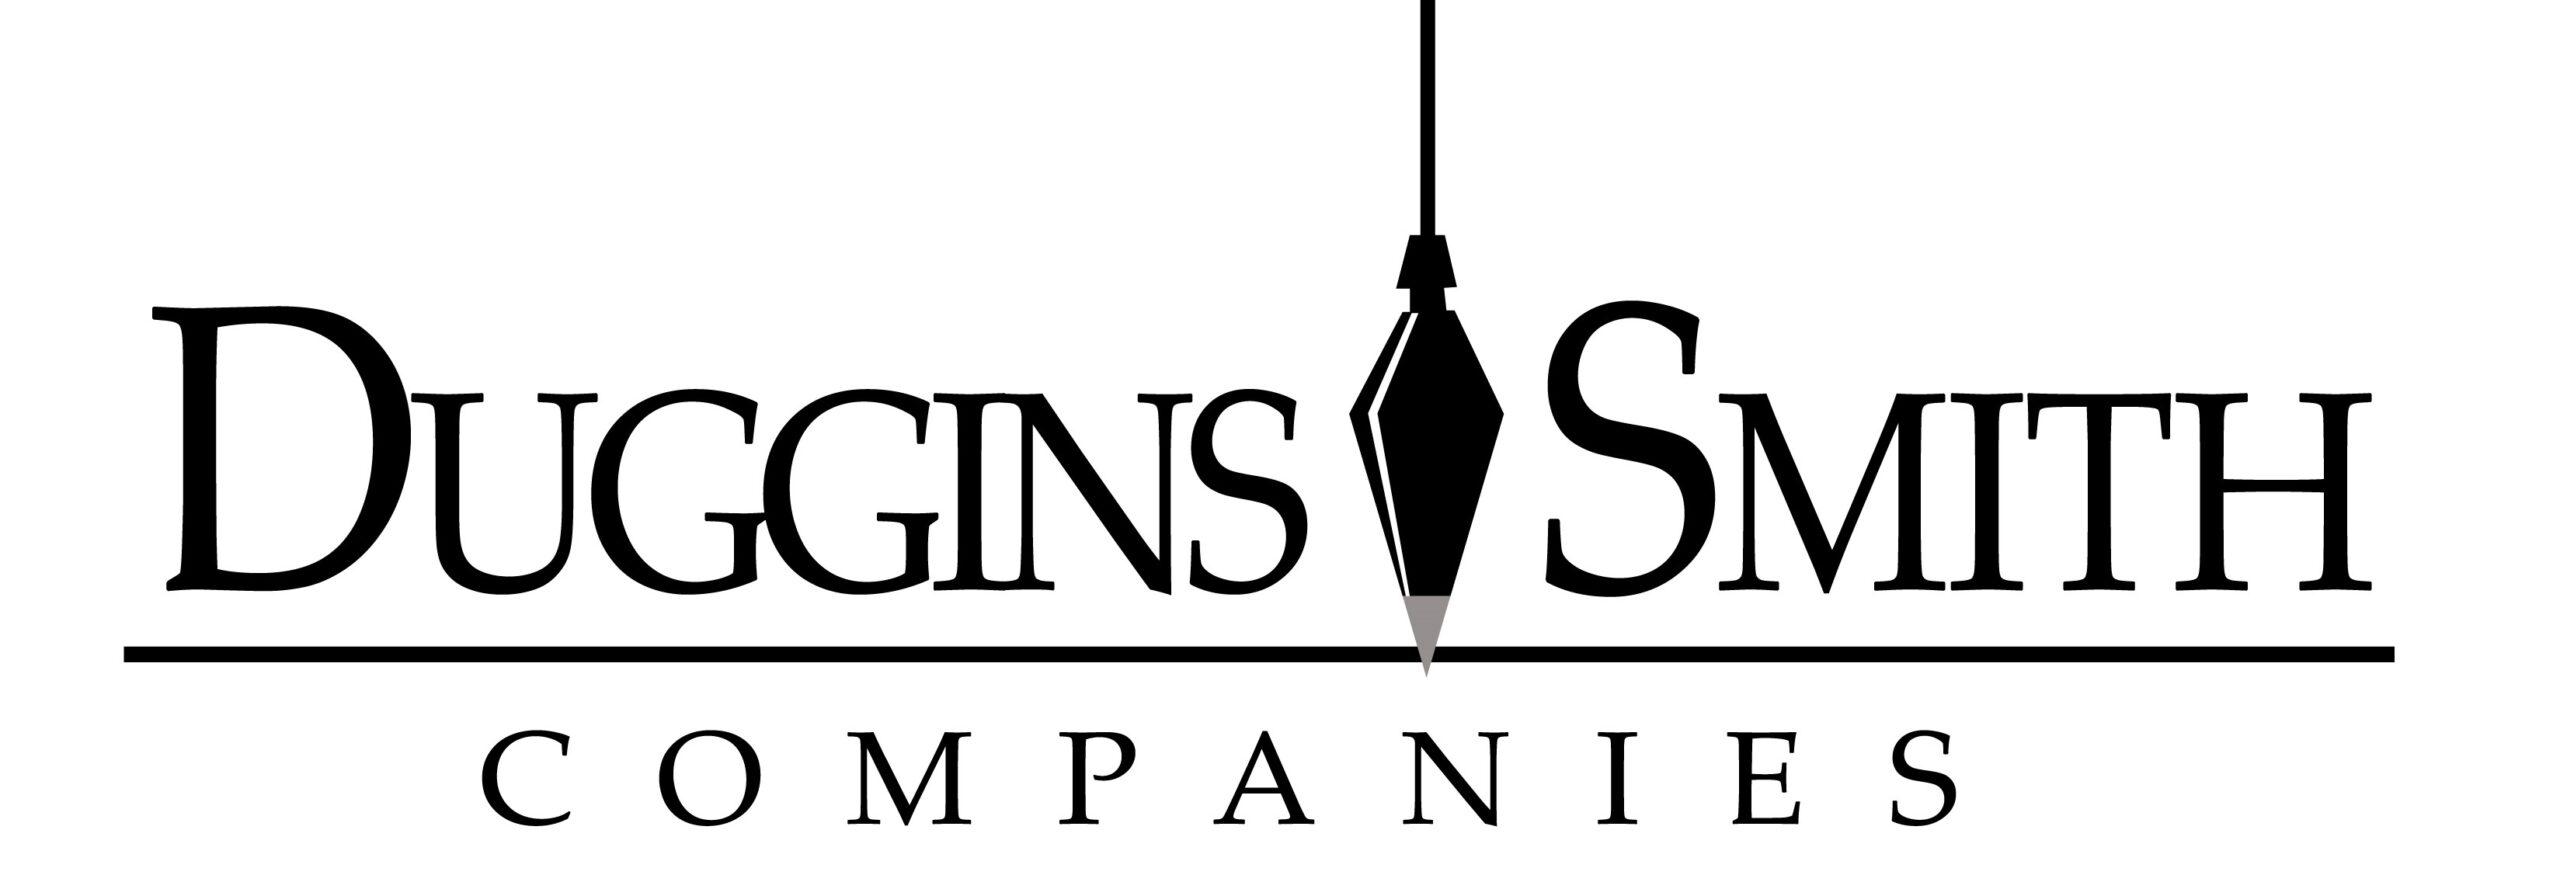 Duggins Smith Companies logo